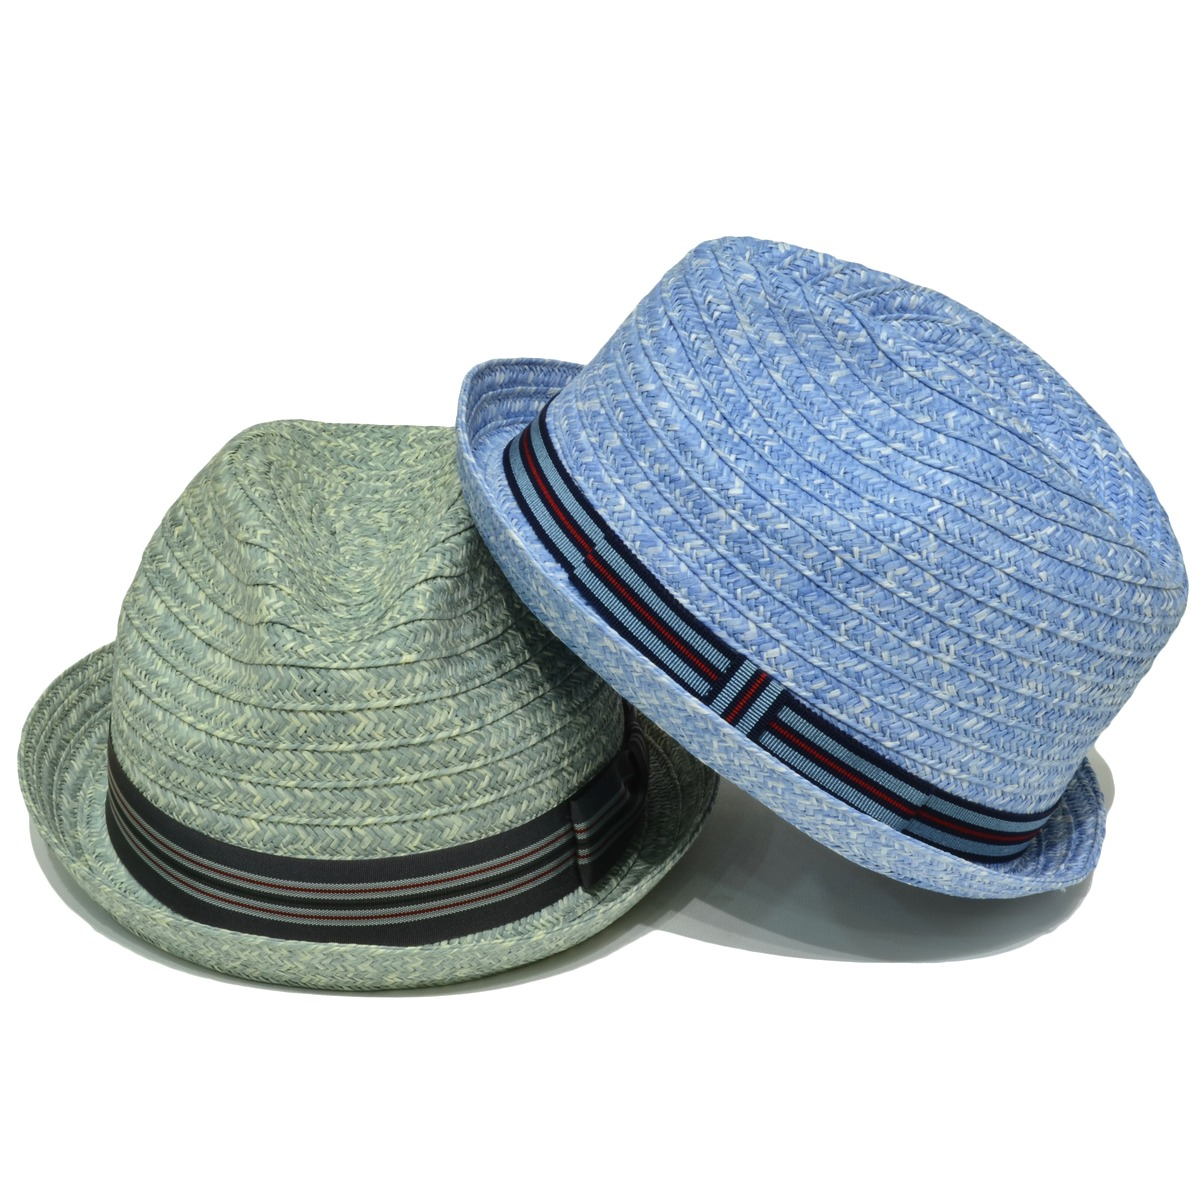 PETO 安东尼 (Anthony pettanko) 混杂岩纸草帽保罗斑点